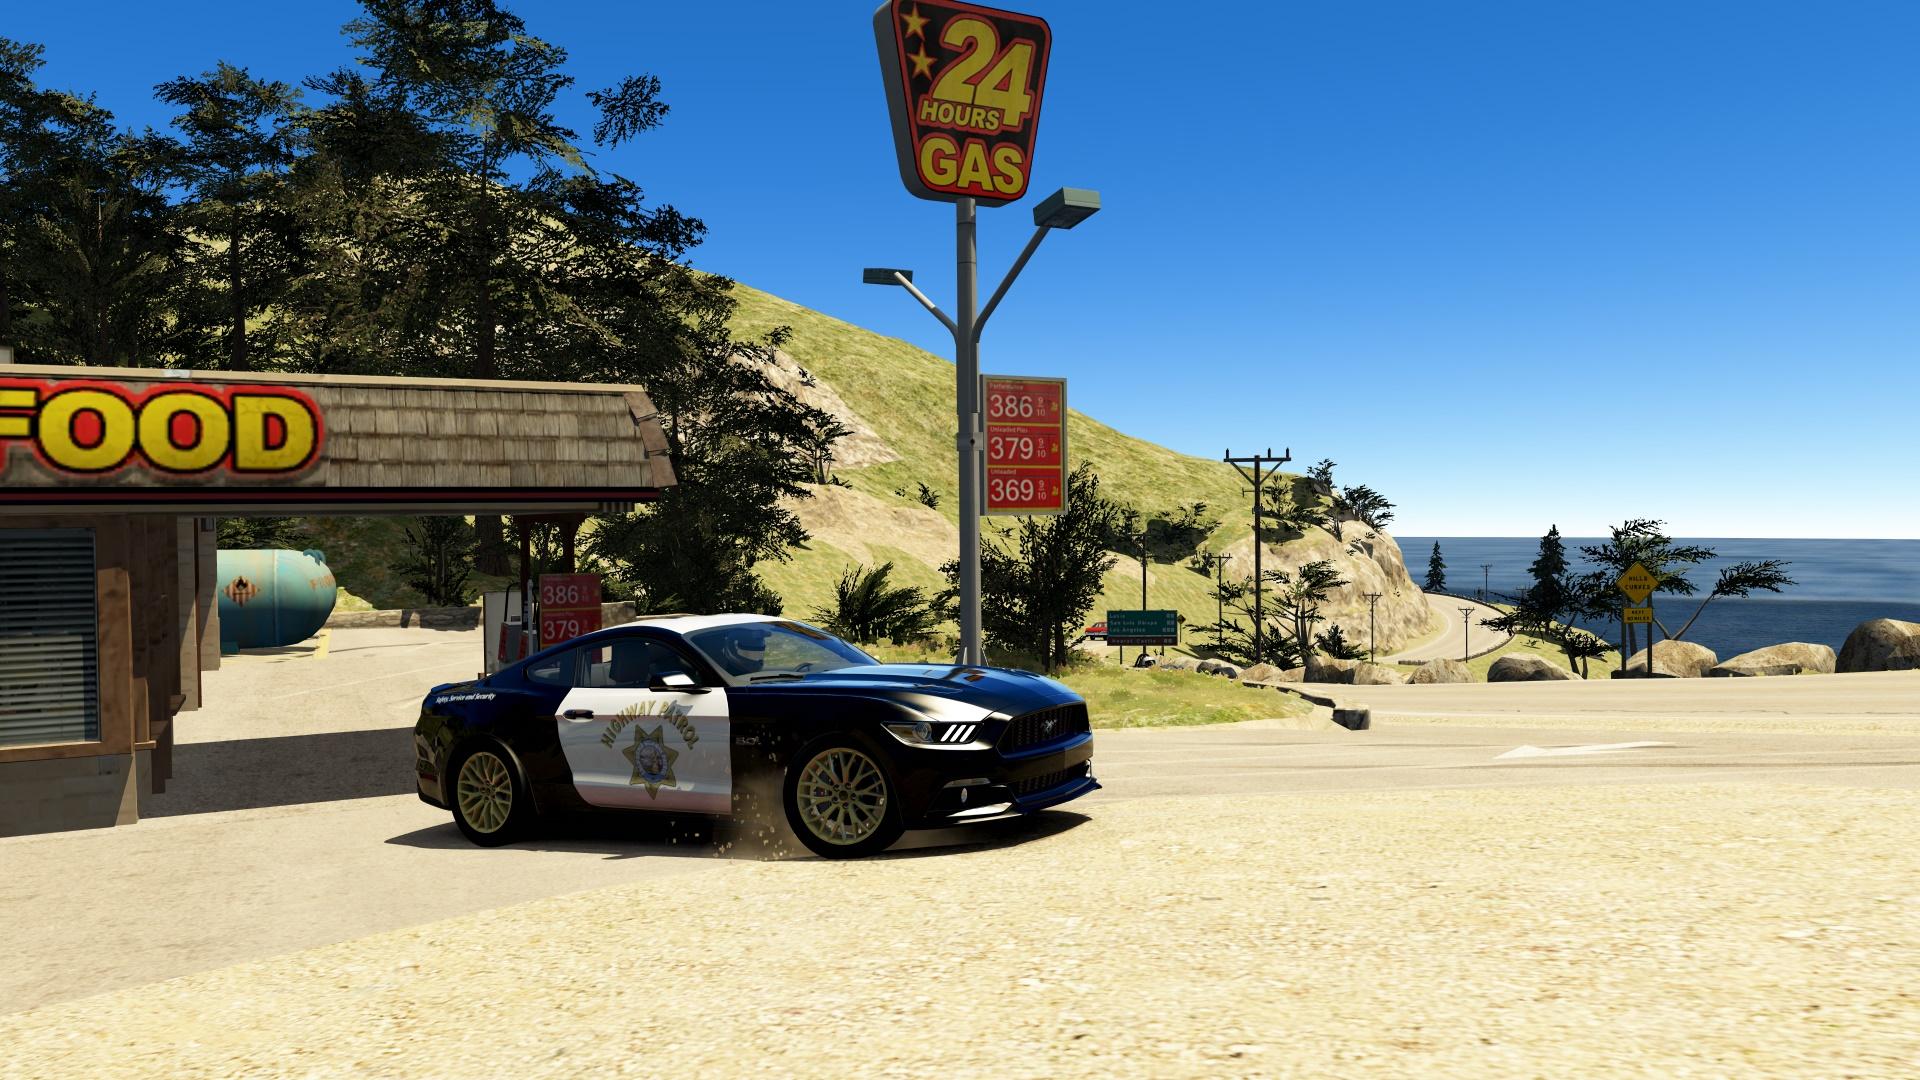 Screenshot_pessio_garage_rd1_californiacoast_5-9-120-3-12-3.jpg